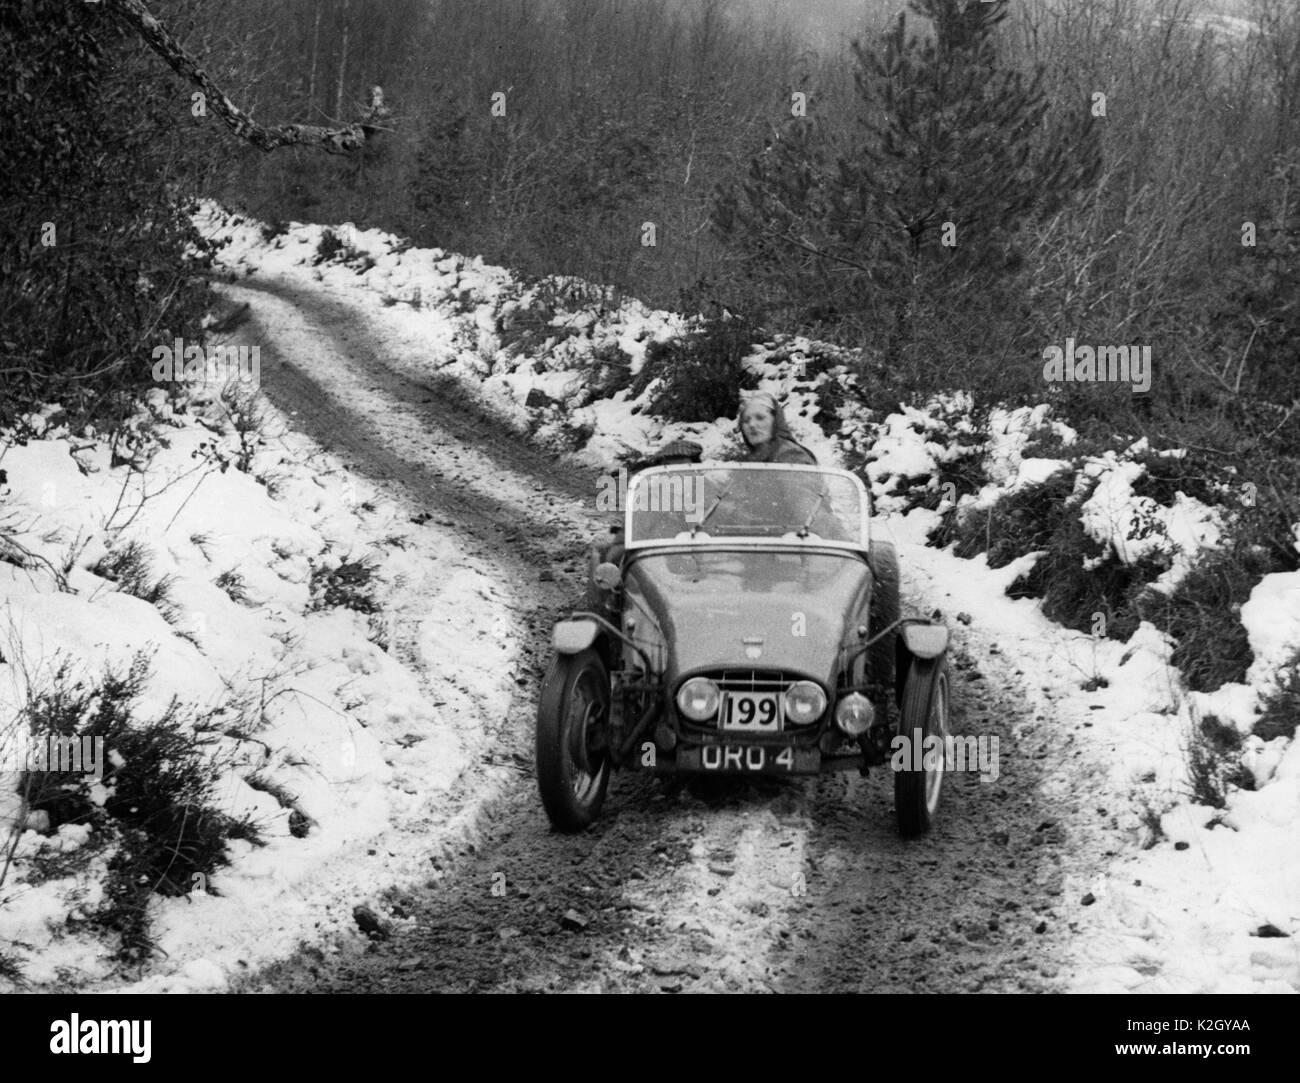 1953 MG Tucker- Peake special. 1953 Exeter trial, Fingle Bridge. - Stock Image